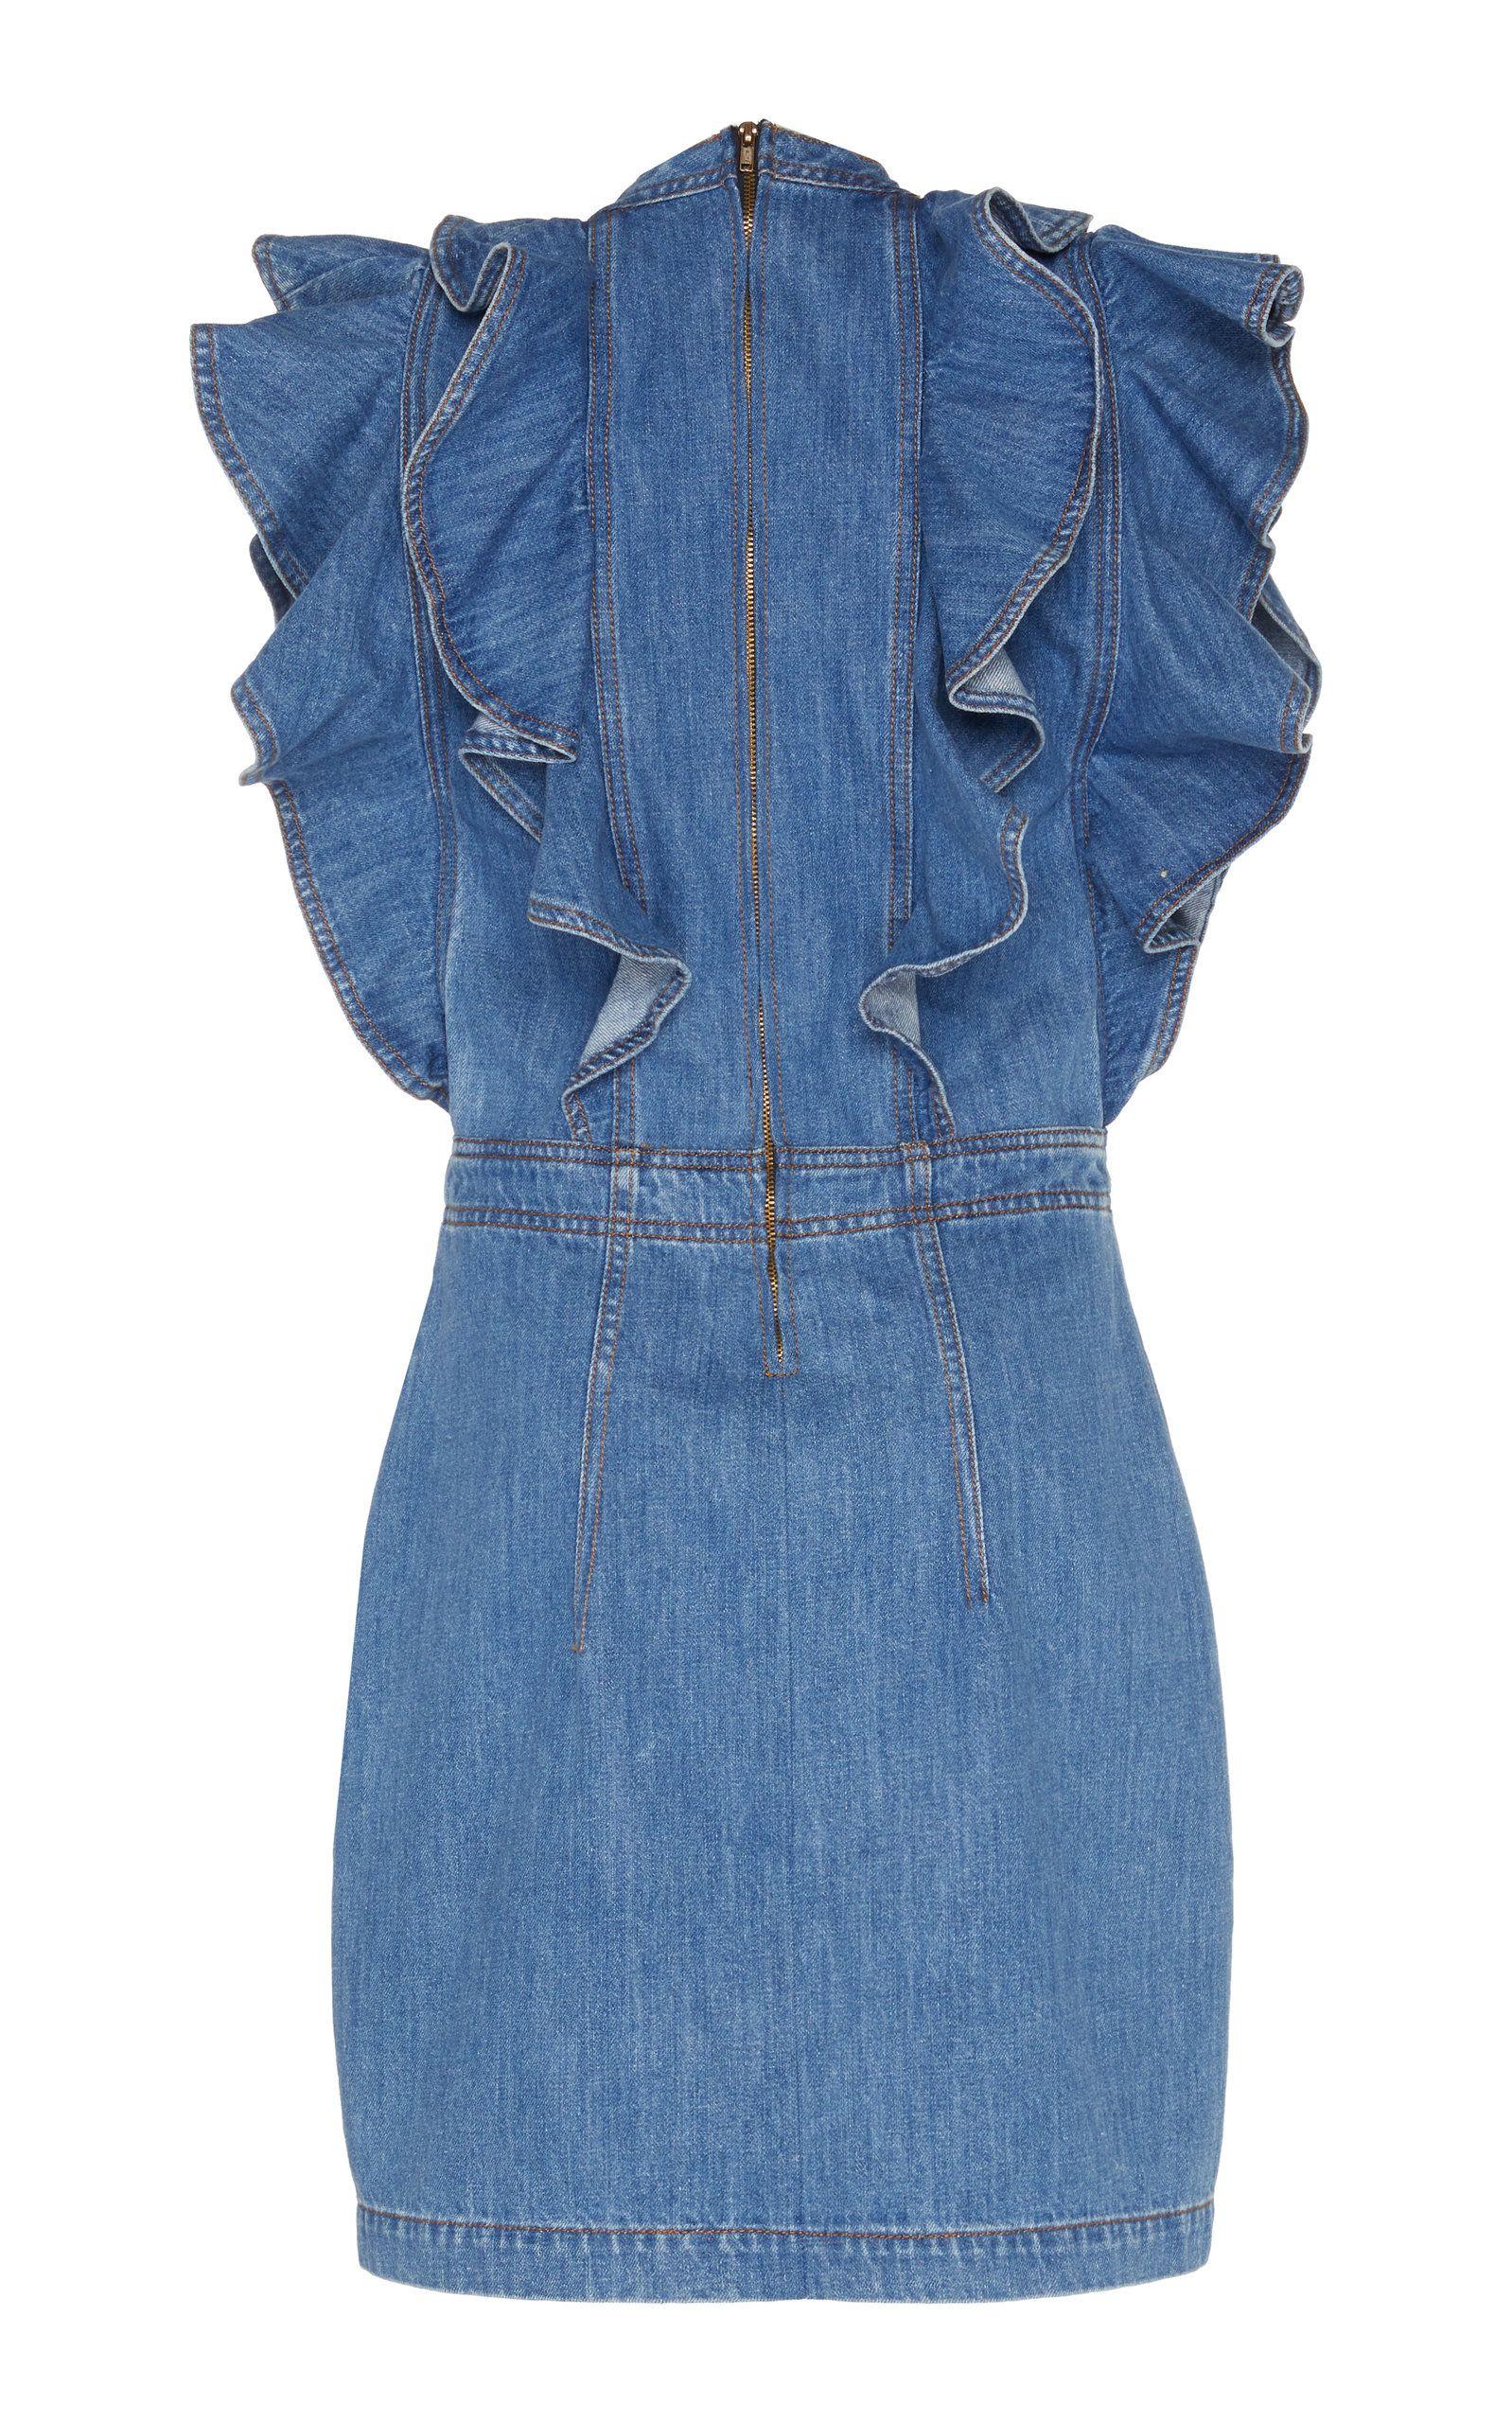 Philosophy Di Lorenzo Serafini Ruffled Denim Mini Dress Denim Mini Dress Fashion Mini Dress [ 2560 x 1598 Pixel ]